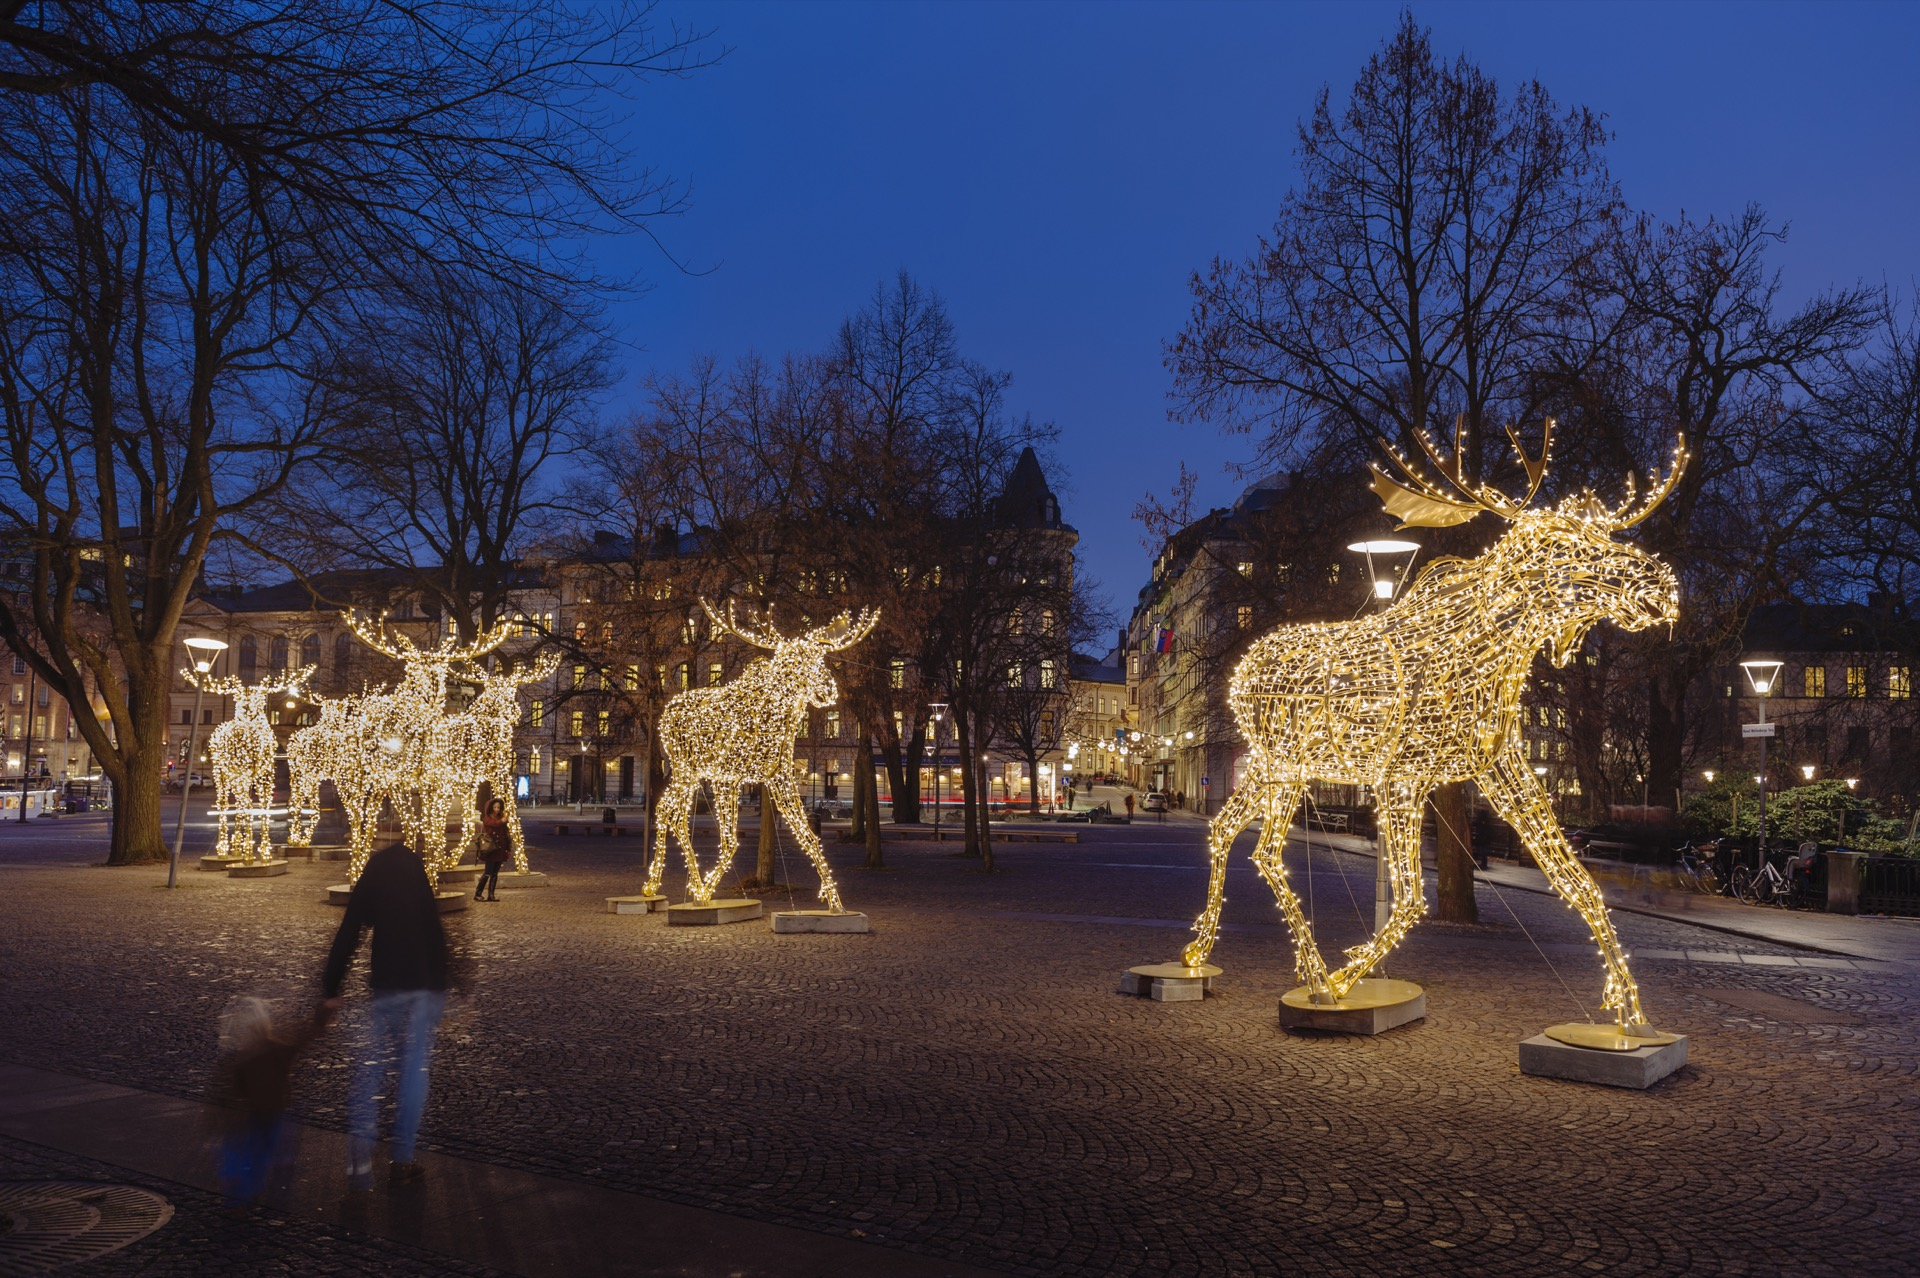 Älgarna på Nybroplan. Foto: Mikael Sjöberg